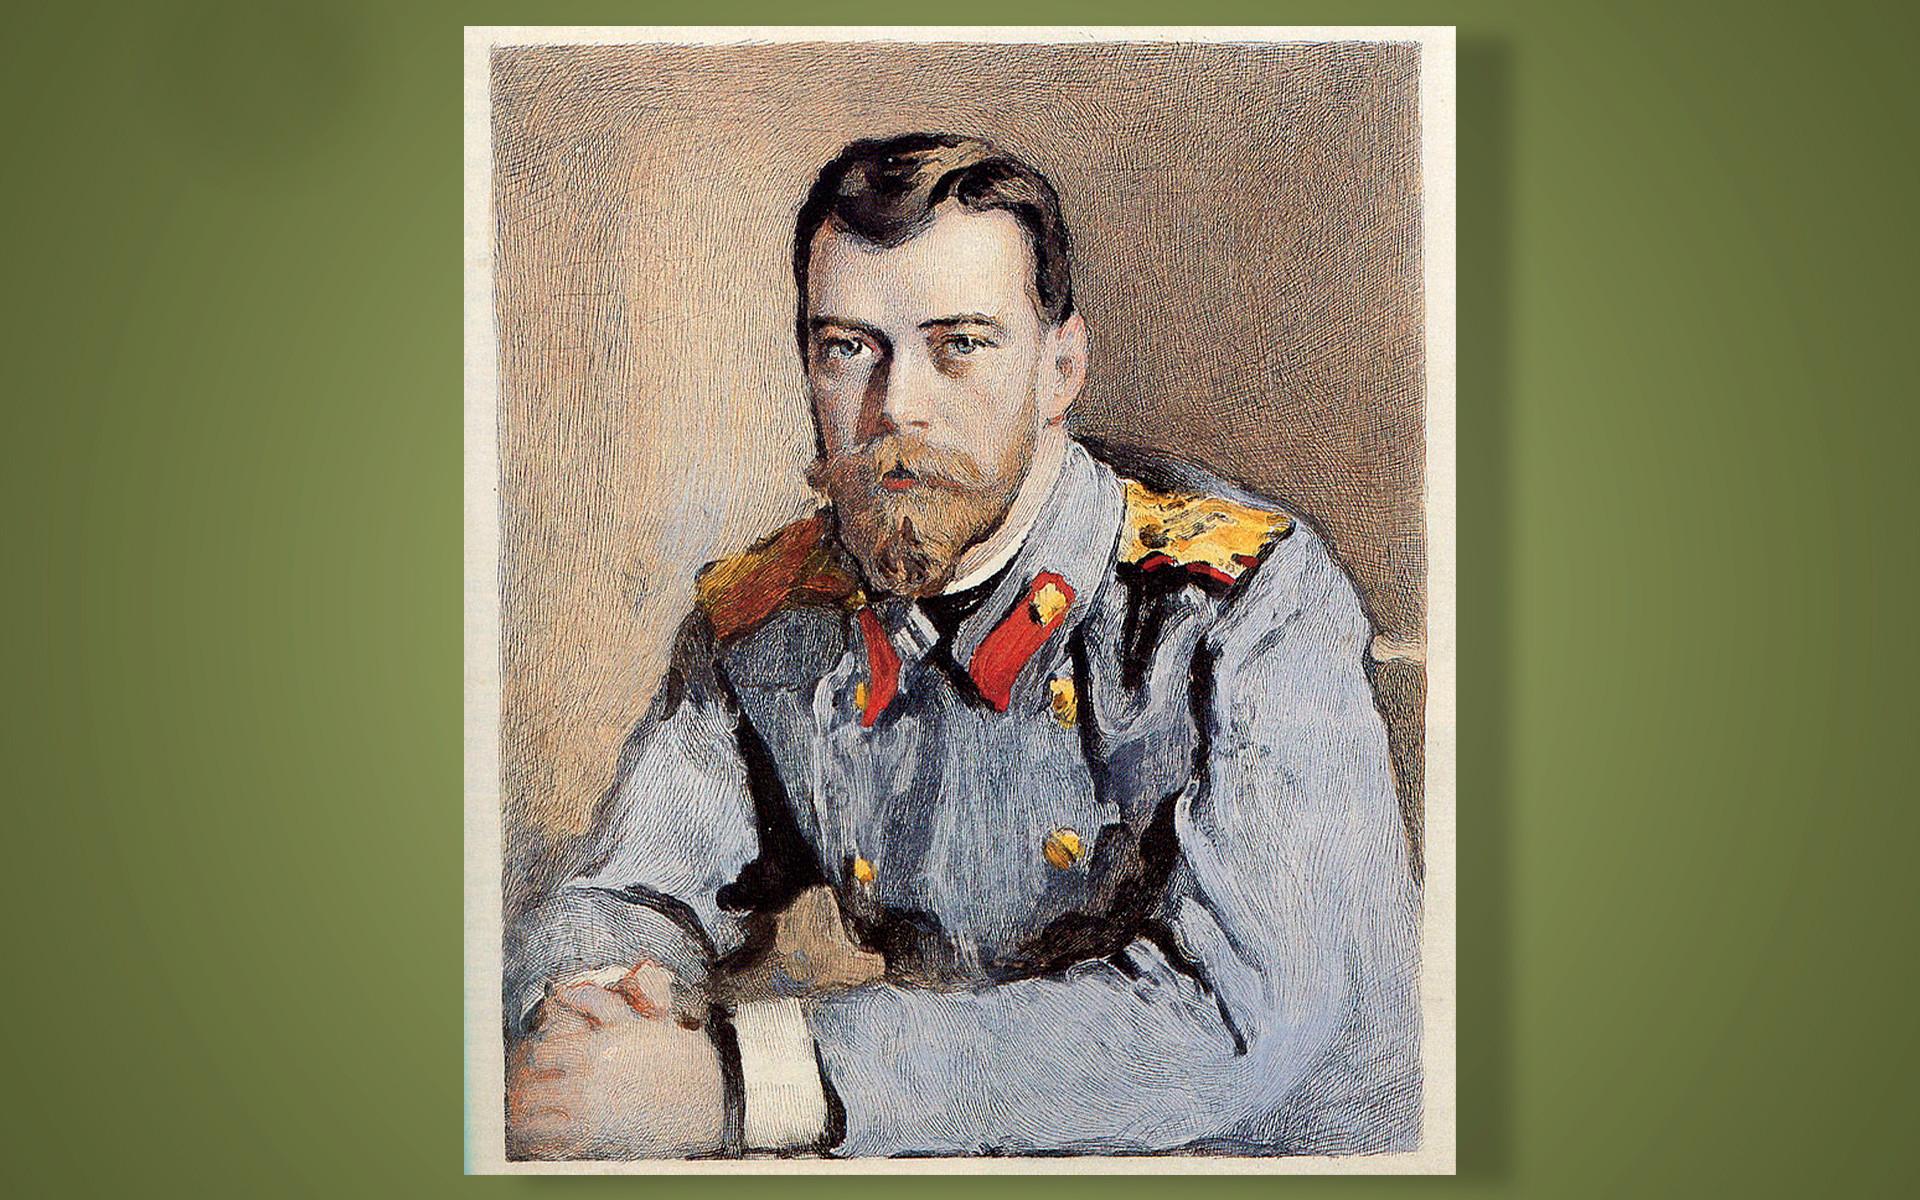 Emperor Nicholas II of Russia wearing a tuzhurka